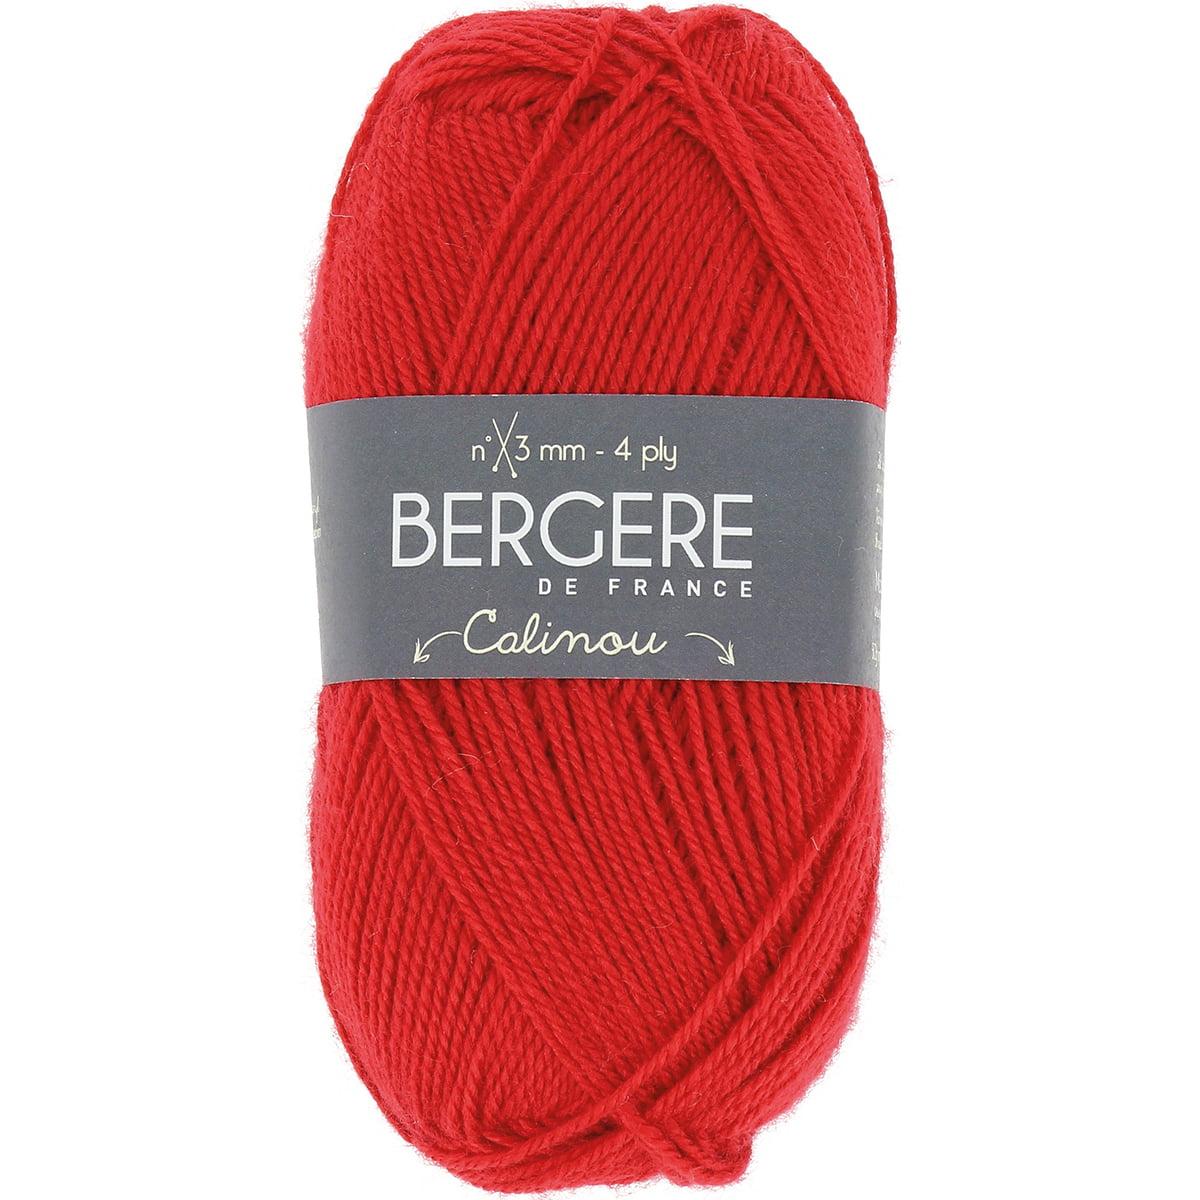 Bergere De France Calinou Yarn-Grenadine